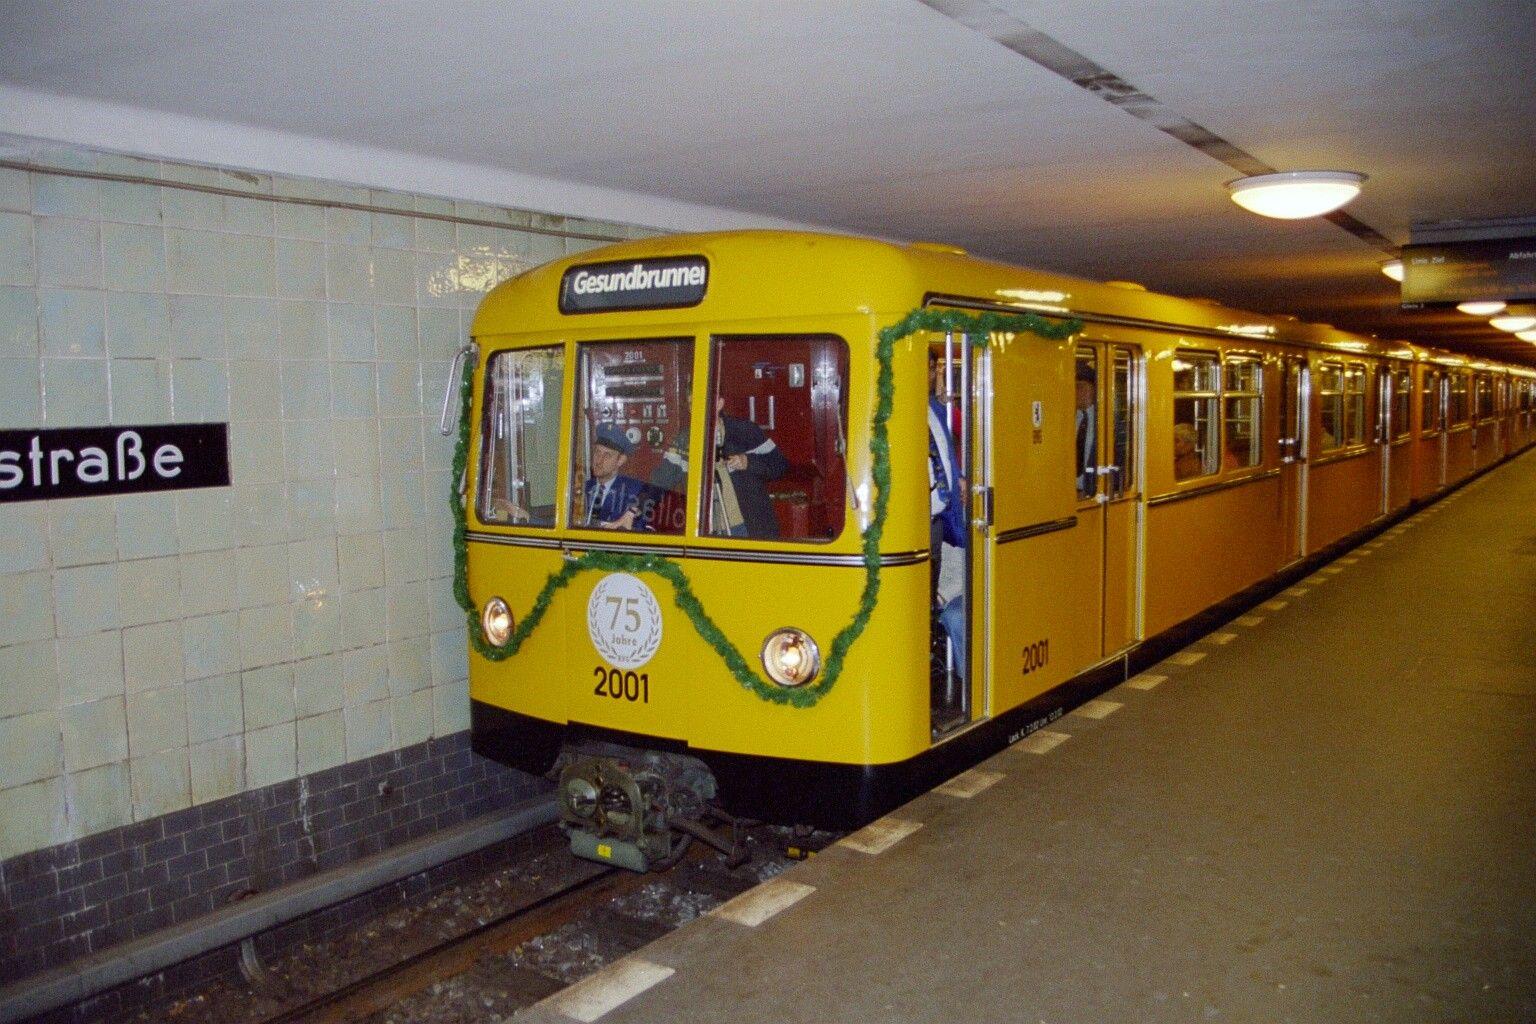 U-Bahn 2001